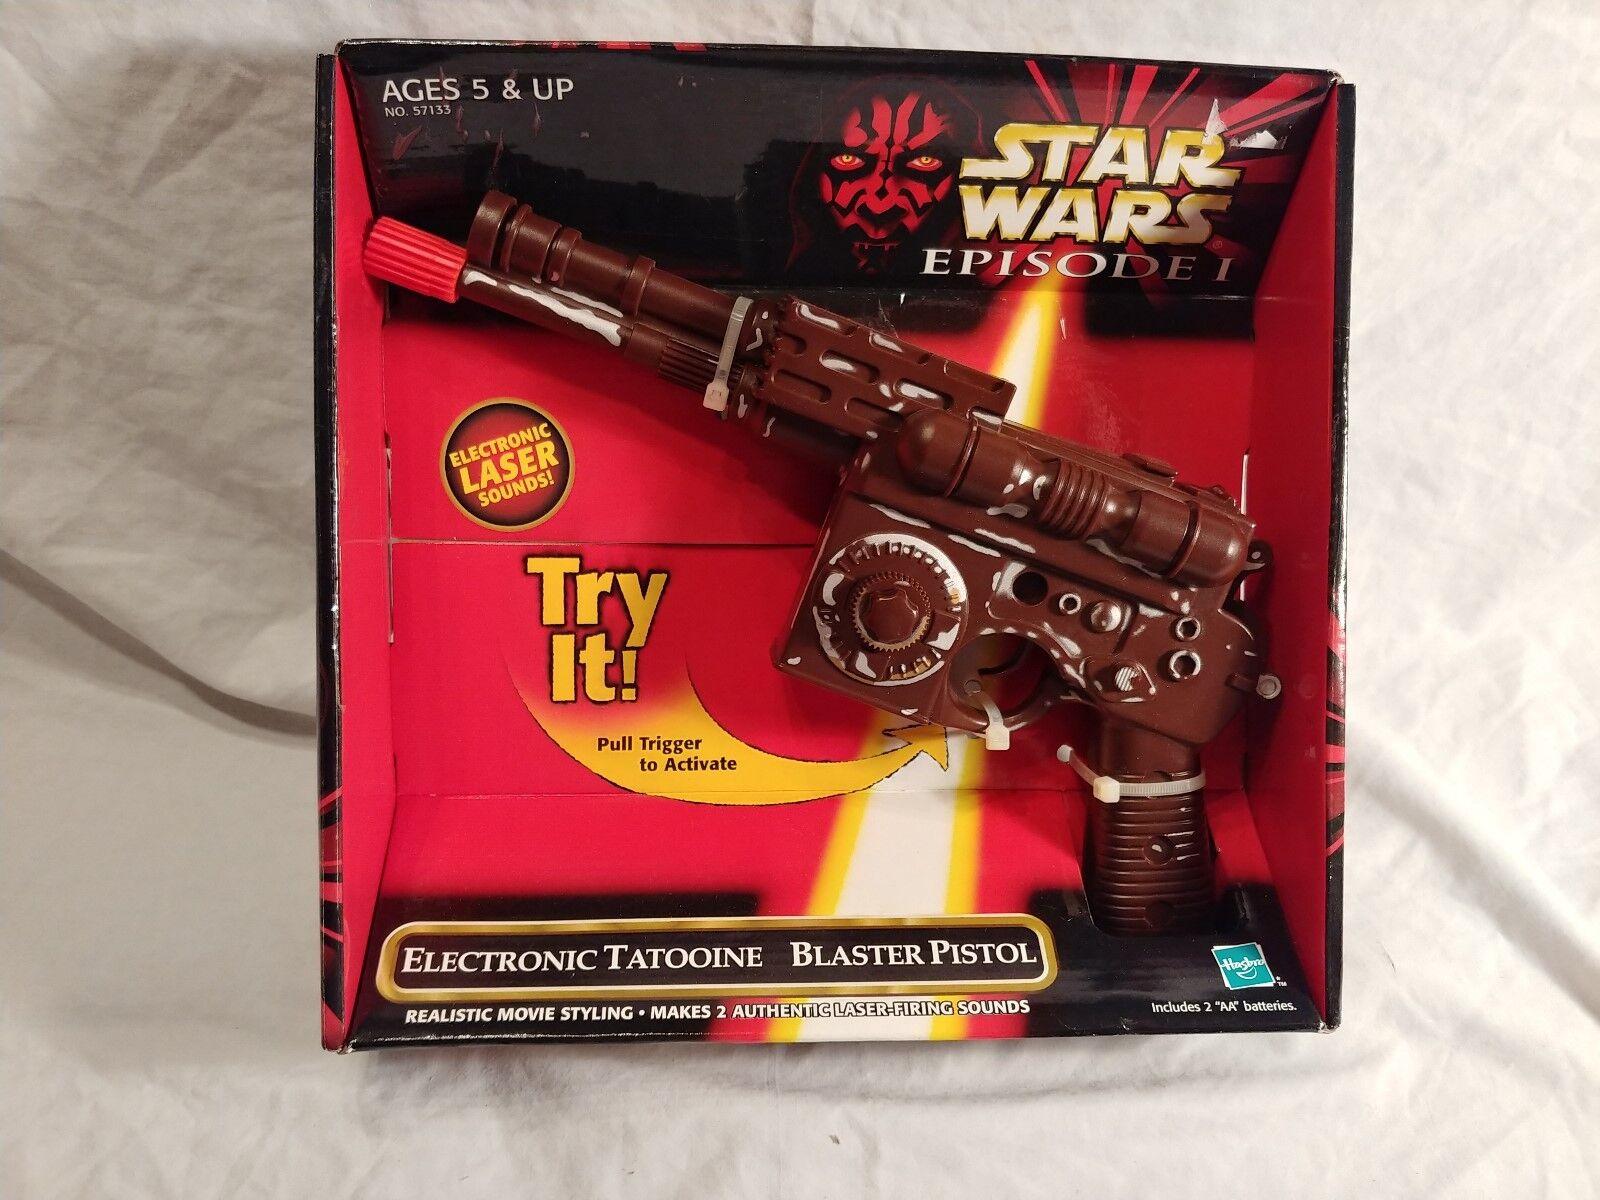 Star Wars Episode I Electronic Tatooine Blaster Pistol 1998